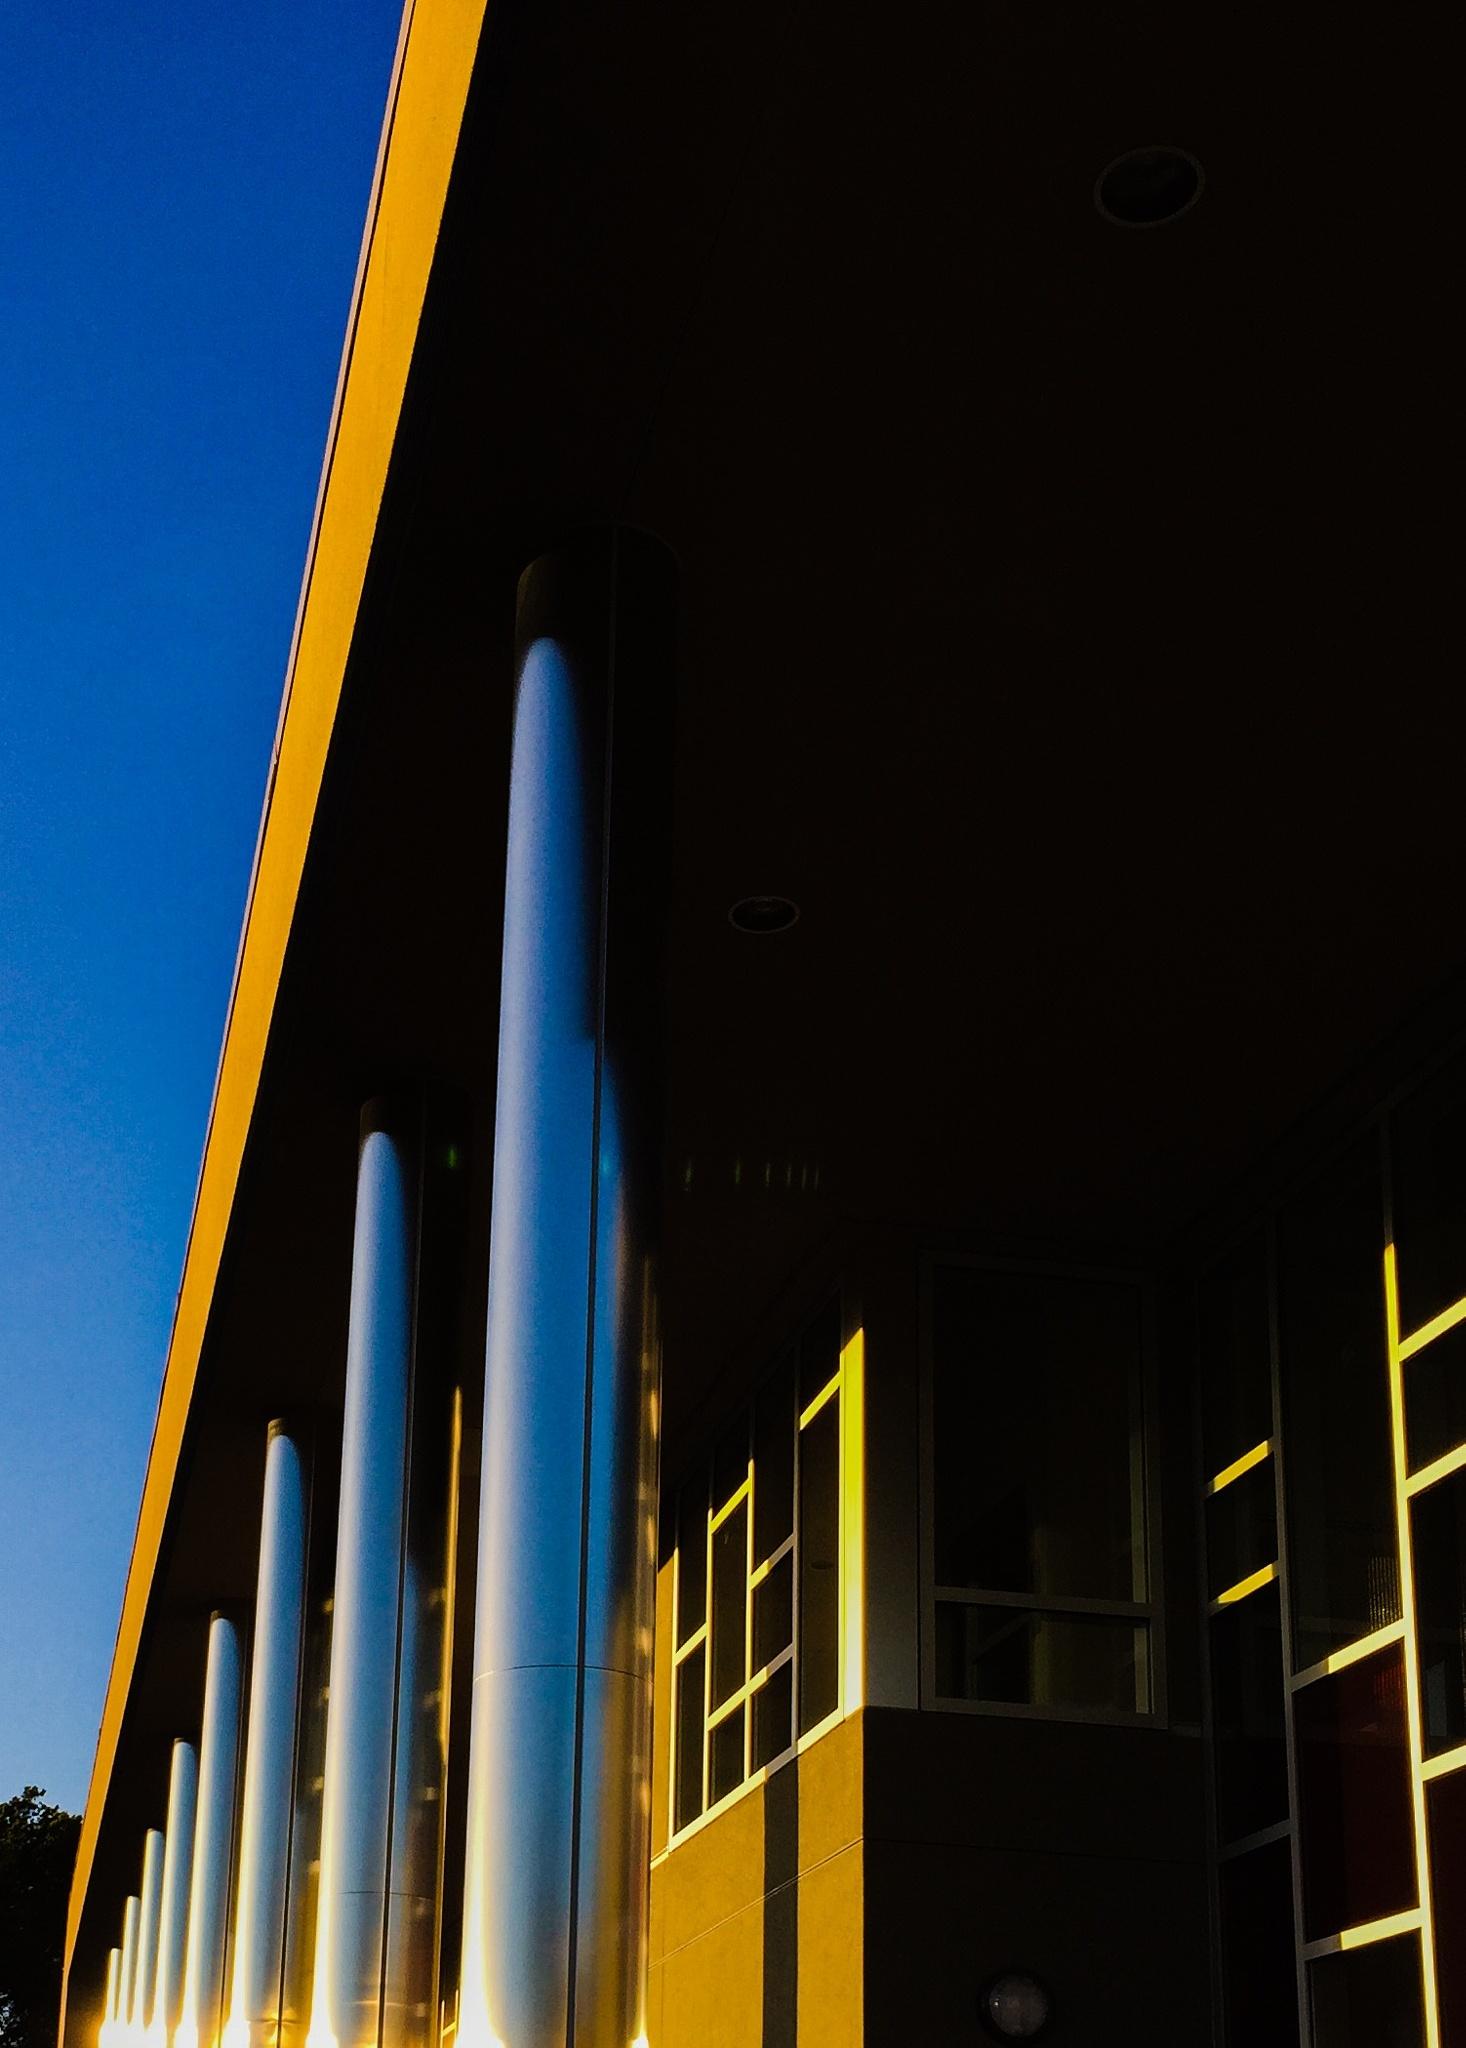 New High School Arts & Entertainment Center by kkstephenson